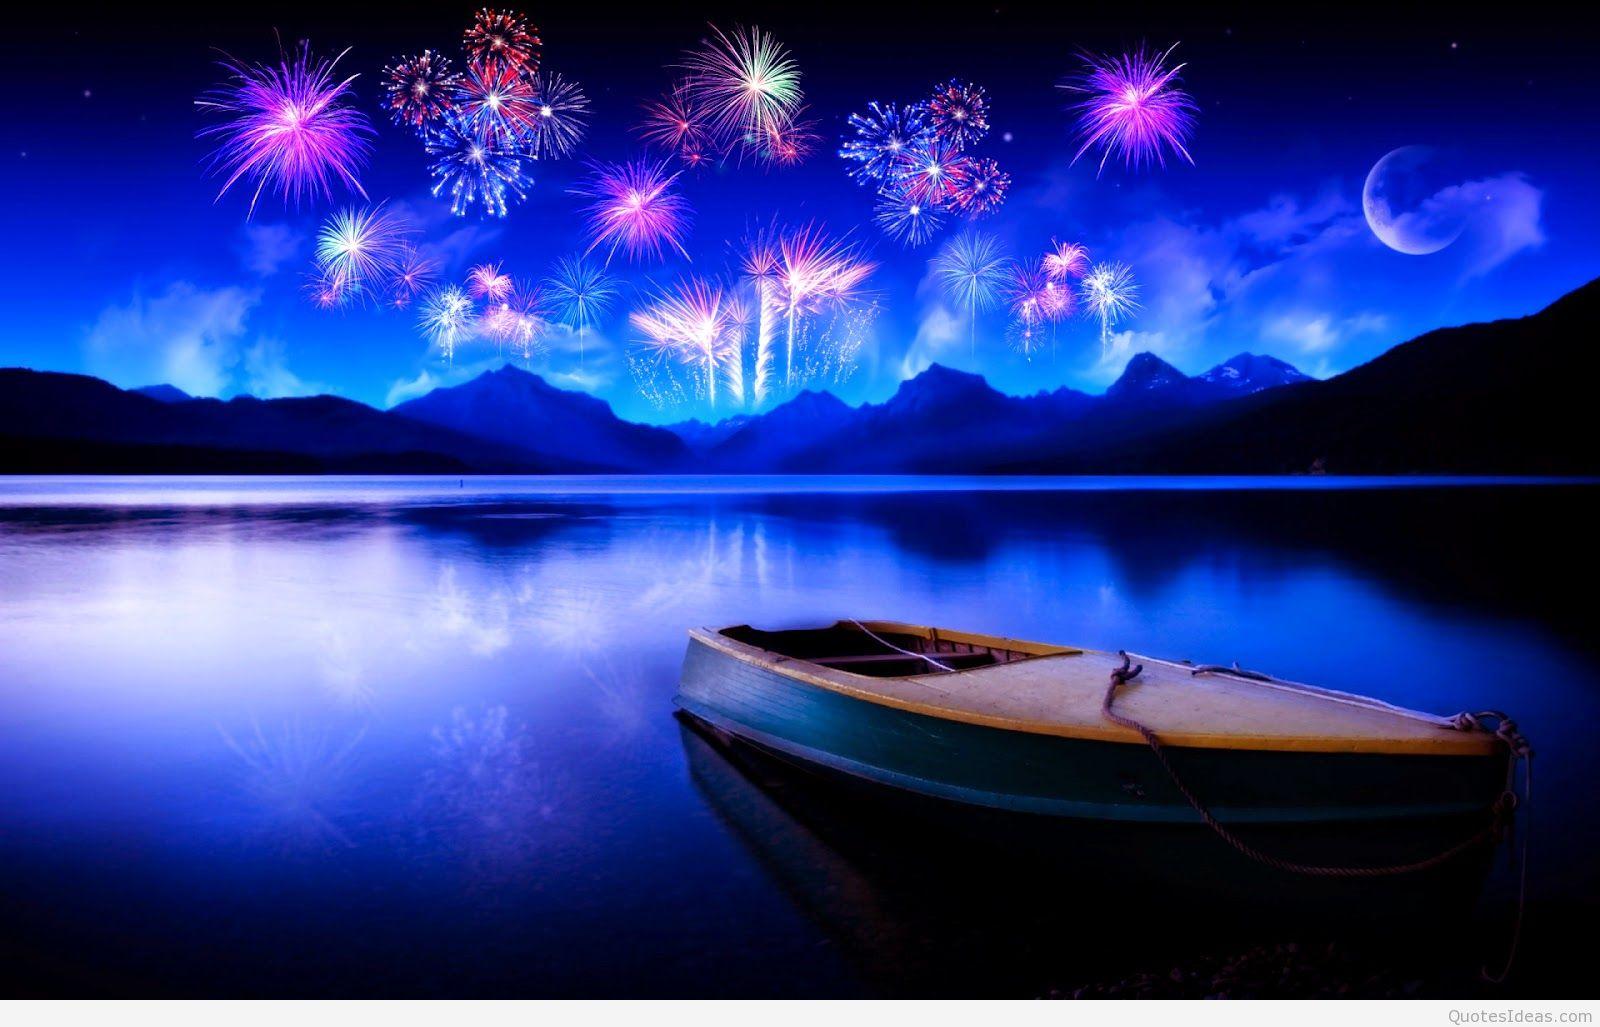 Happy New Year 2016 Greetings Happy New Year 2017